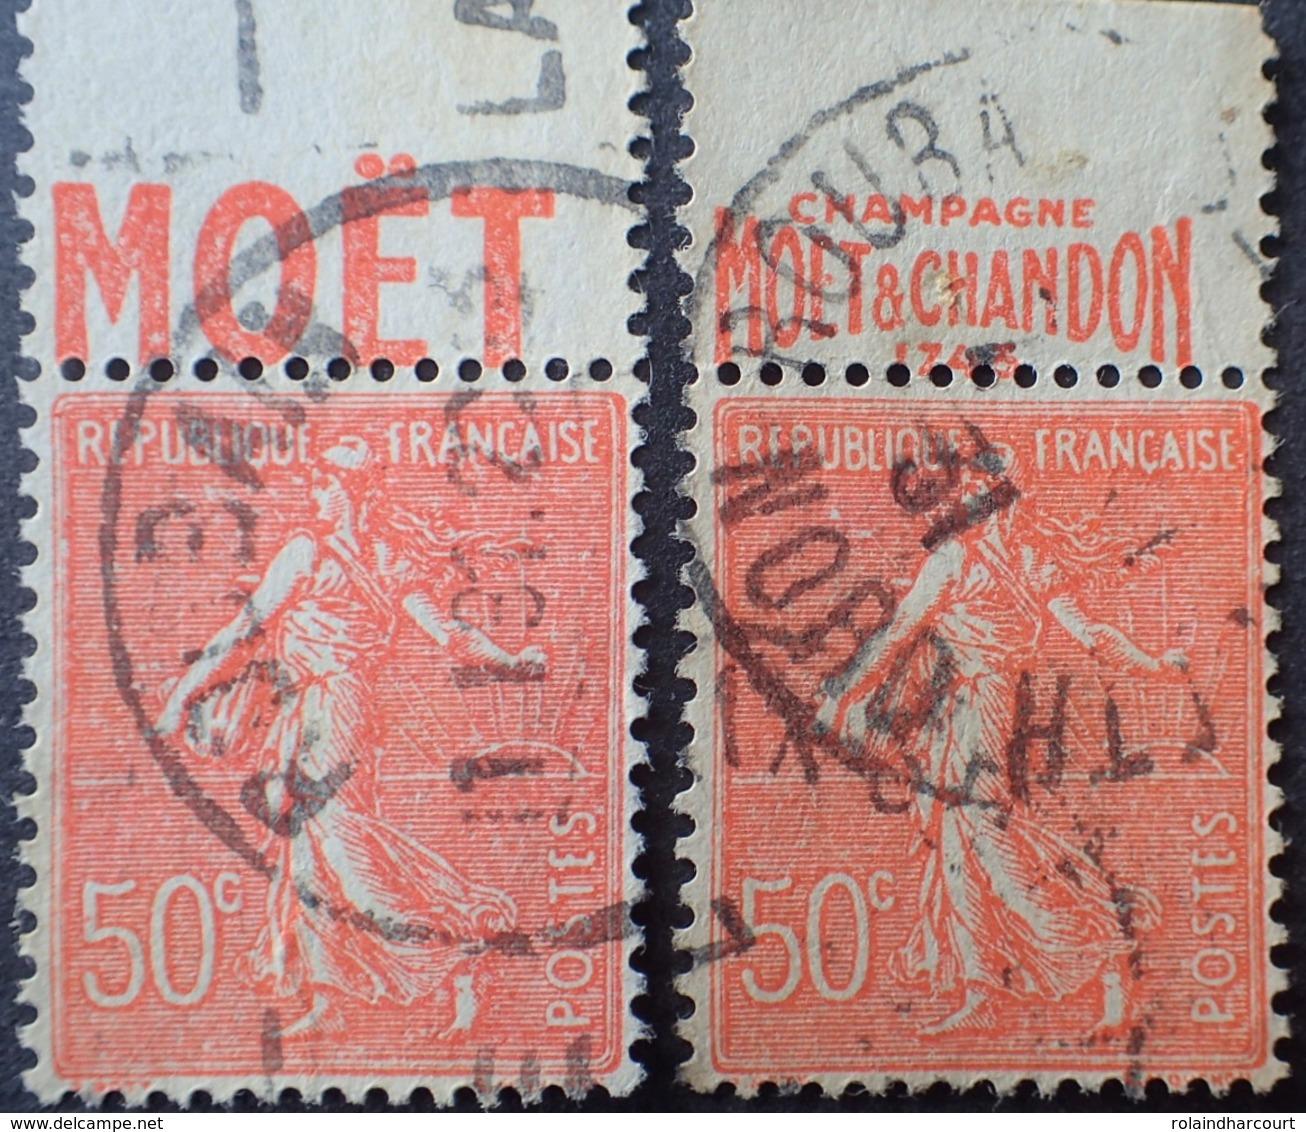 R1934/88 - 1924 - TYPE SEMEUSE LIGNEE - N°199 ☉ BANDE PUBLICITAIRE ☛ CHAMPAGNE MOET ET CHANDON 1743 - Advertising